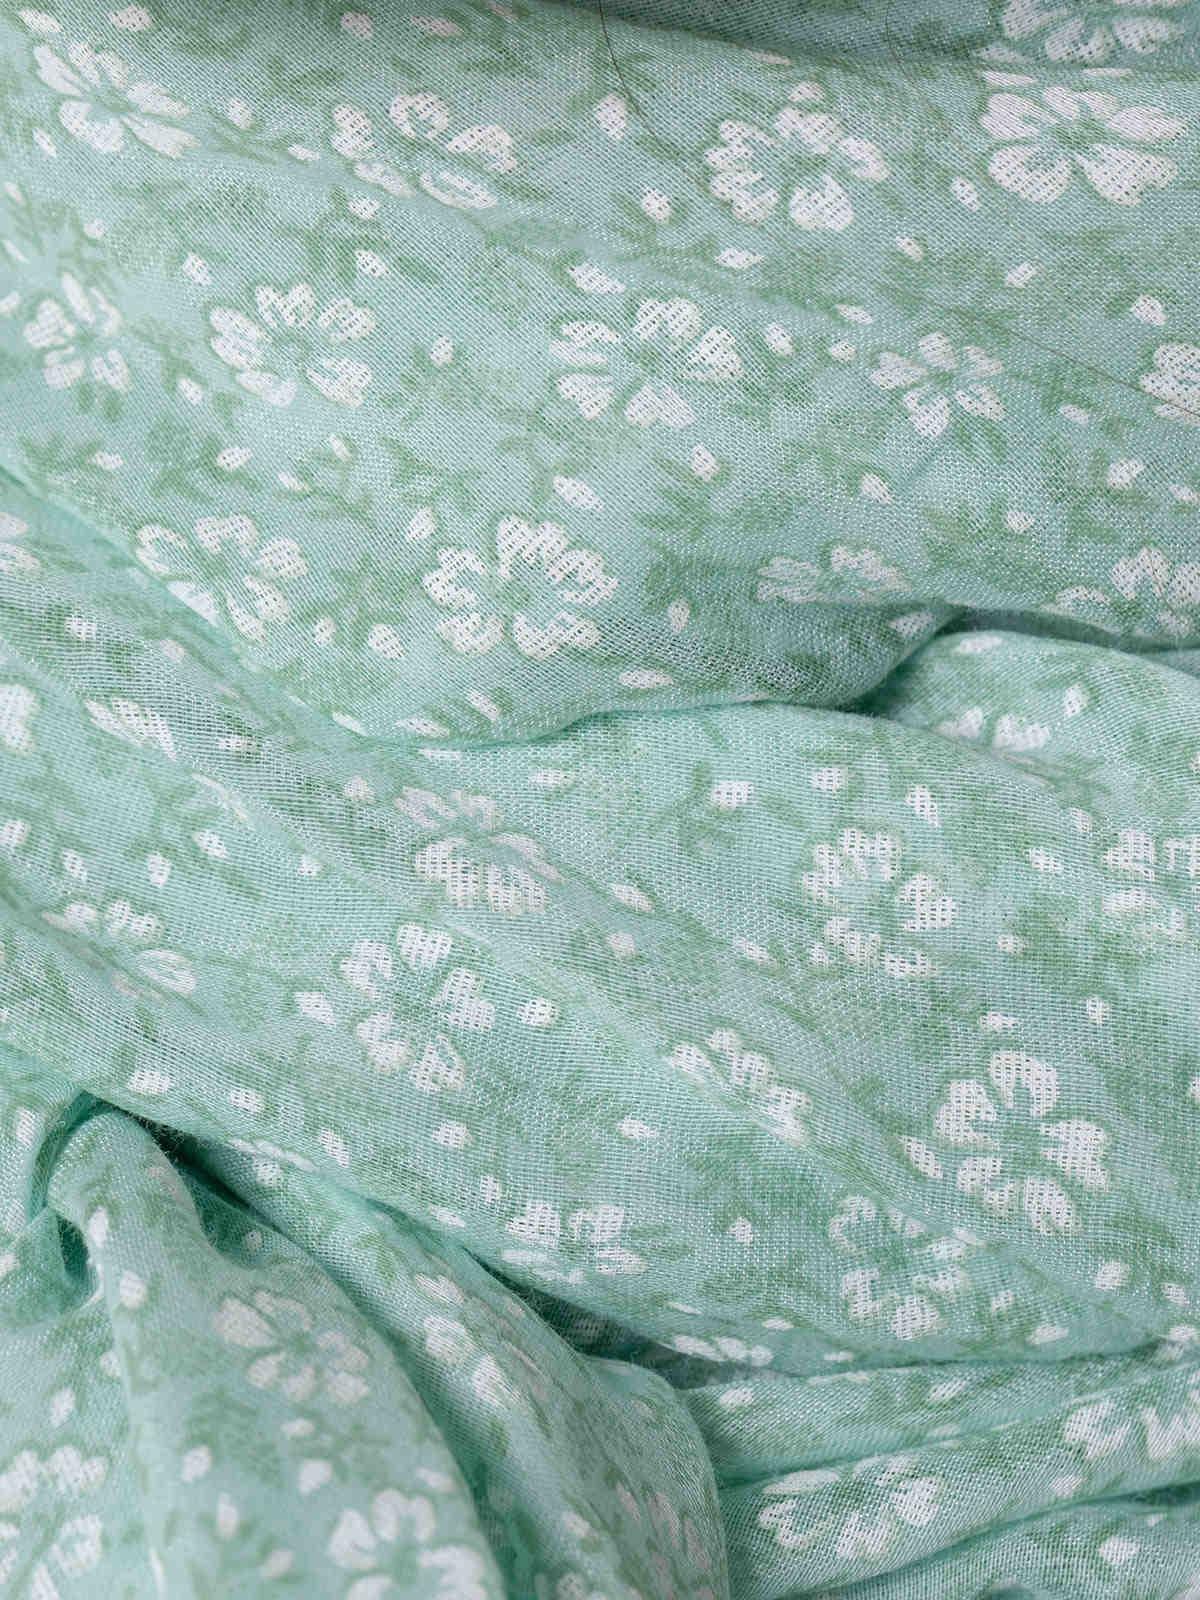 Fular mujer algodón flor monocromático Aqua